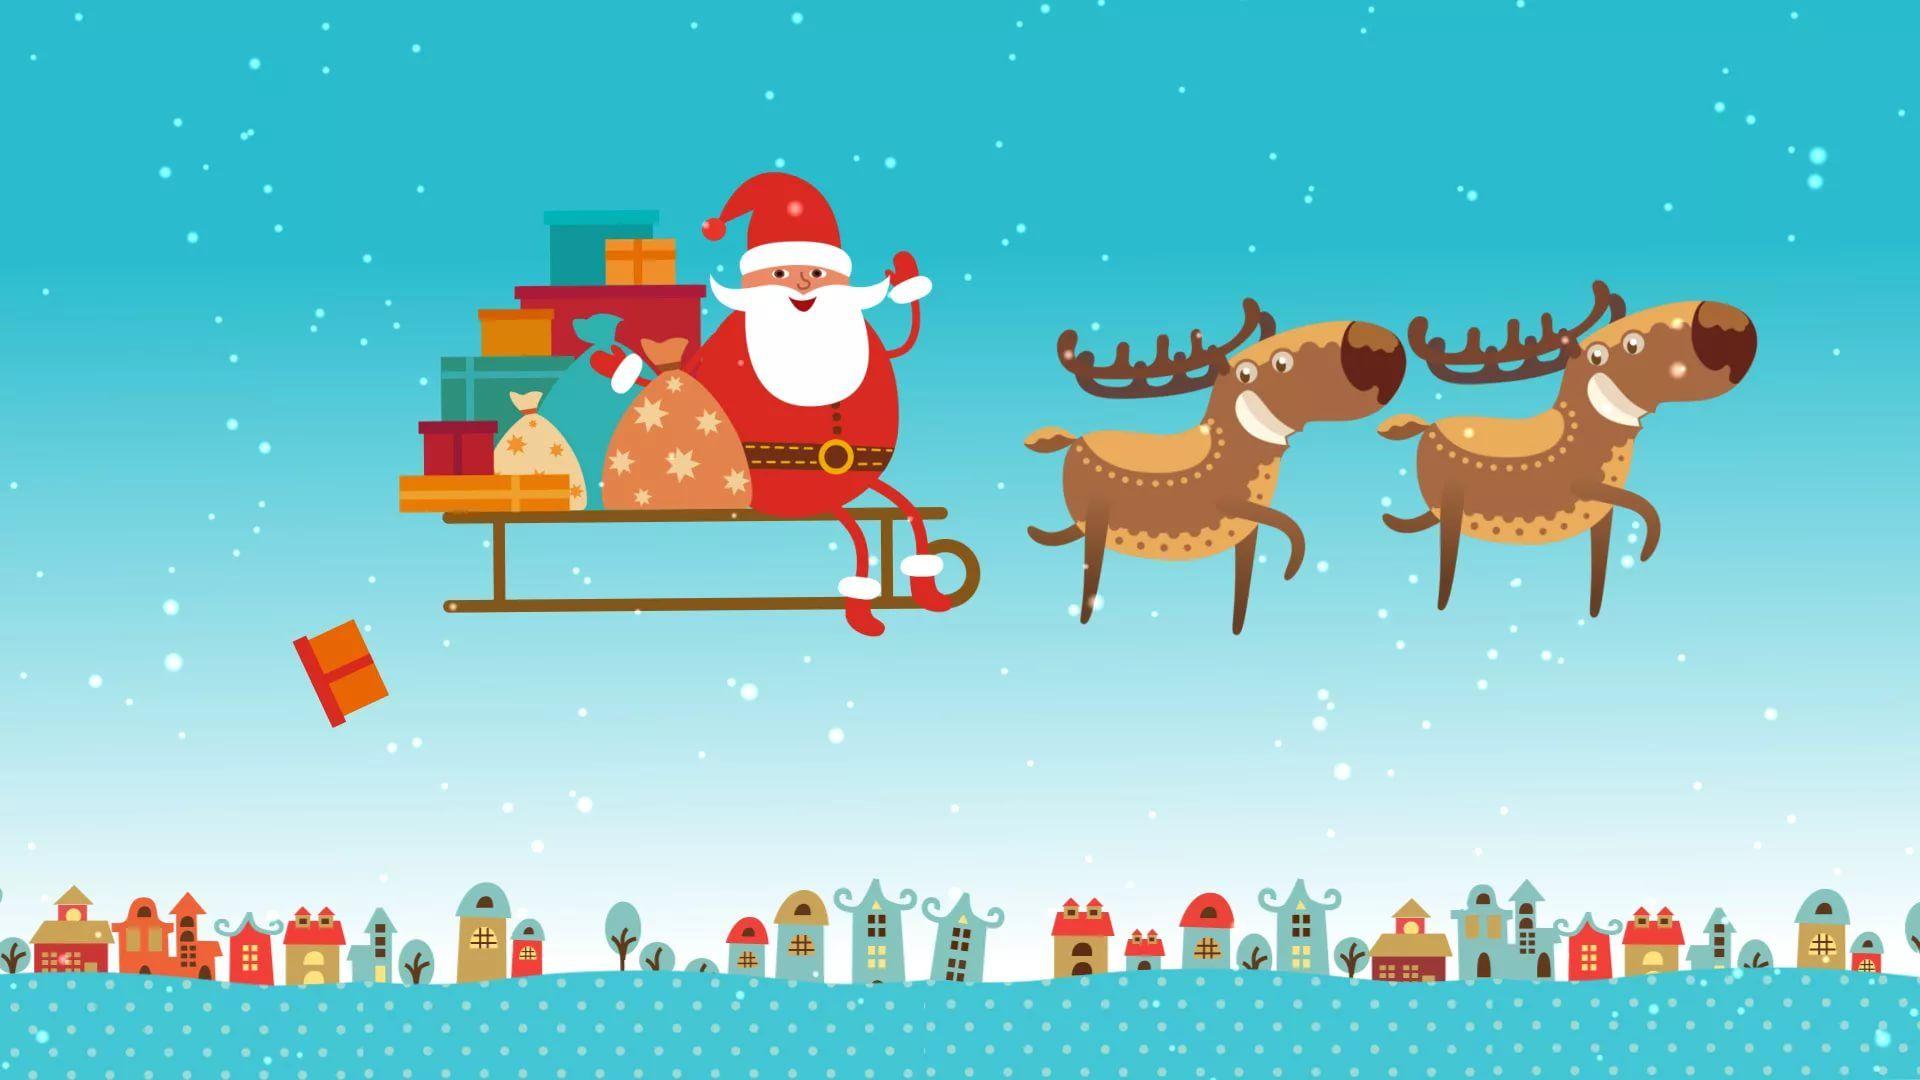 Funny Christmas pc wallpaper